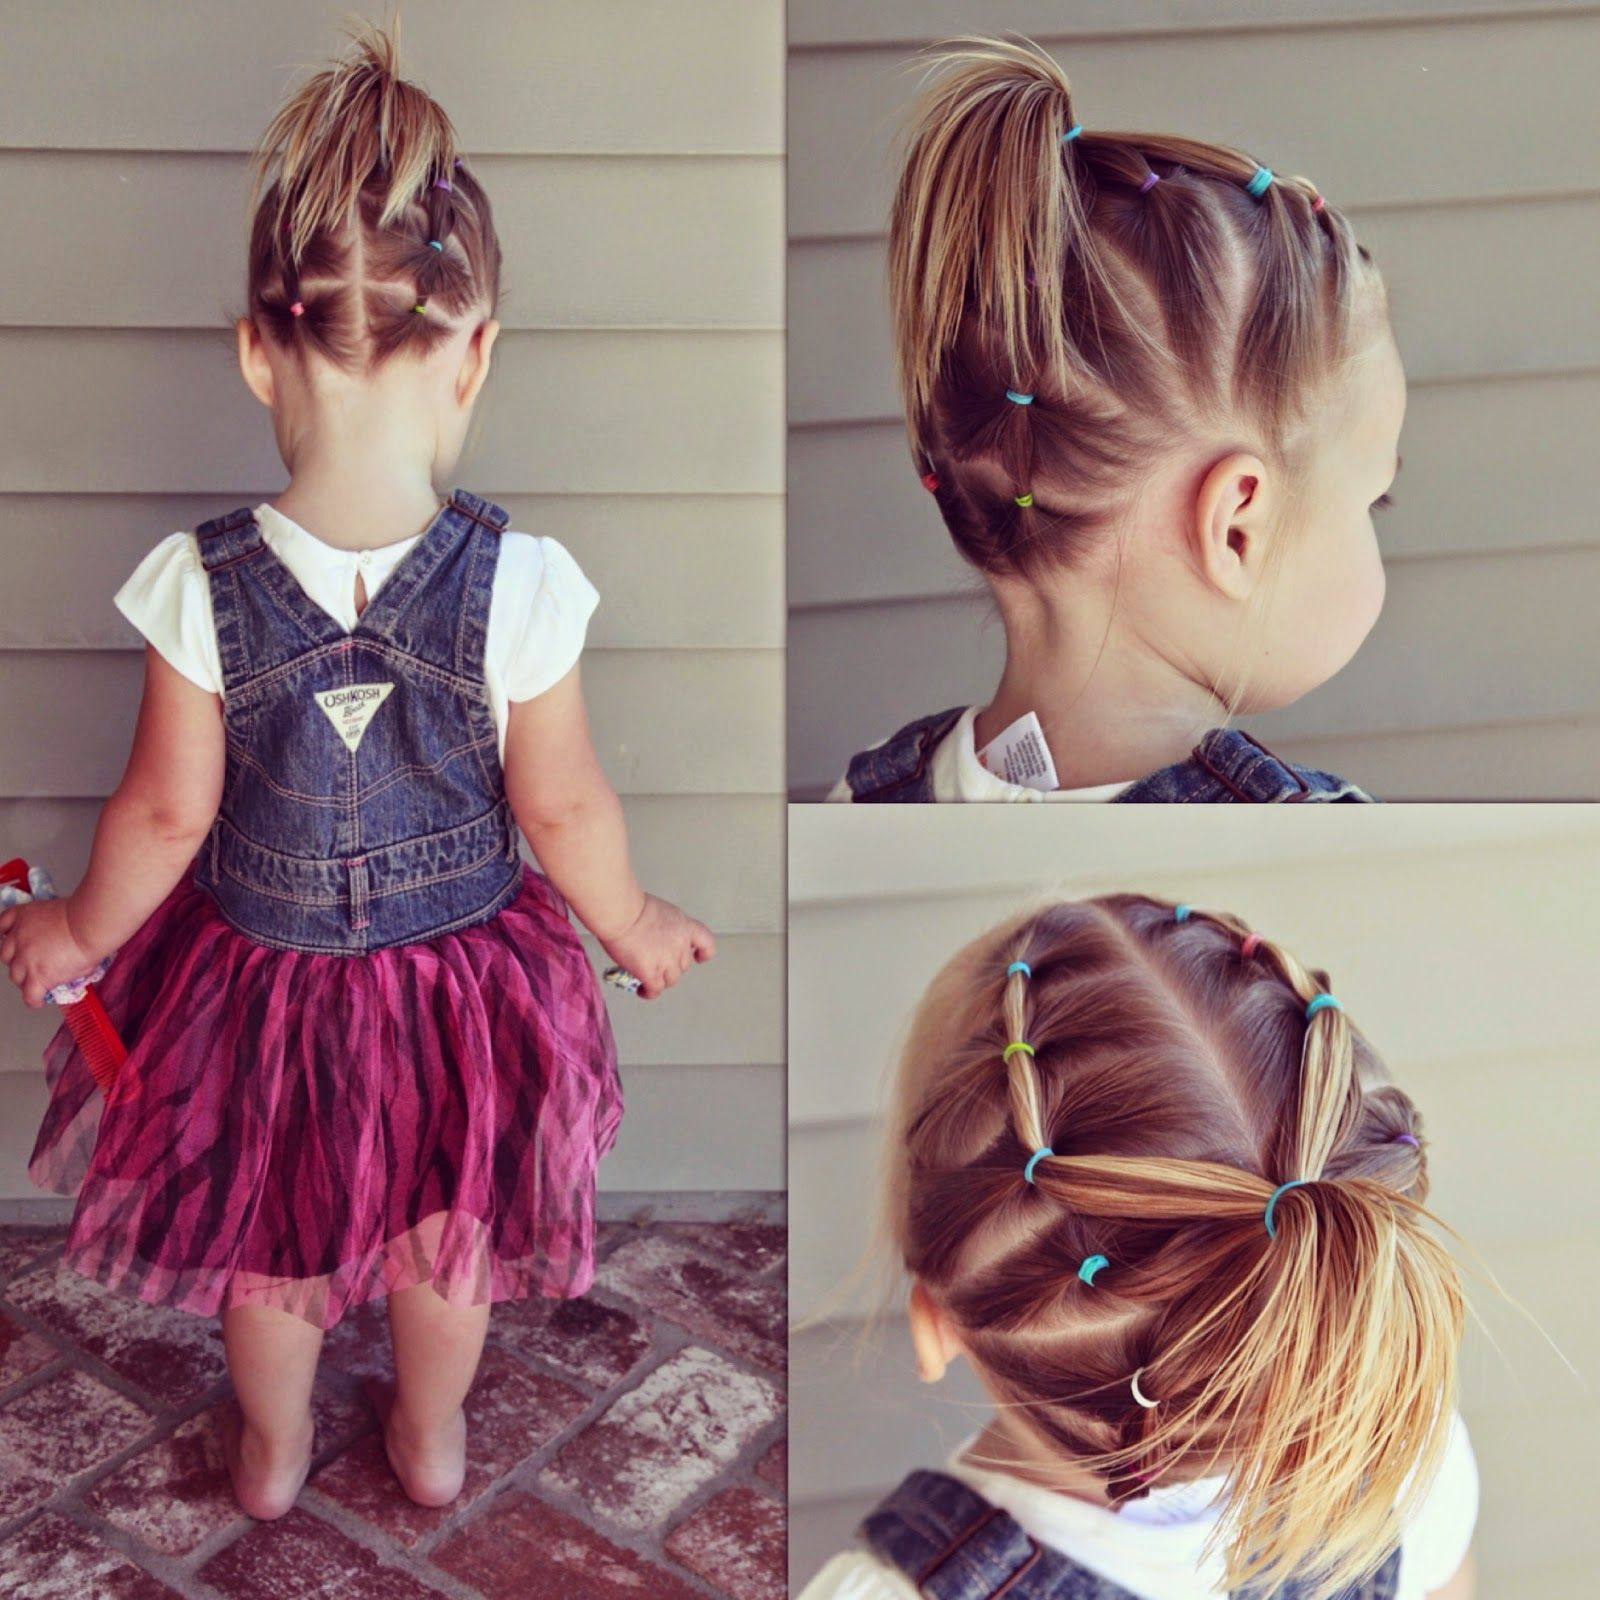 Awe Inspiring 1000 Ideas About Toddler Girls Hairstyles On Pinterest Toddler Short Hairstyles For Black Women Fulllsitofus